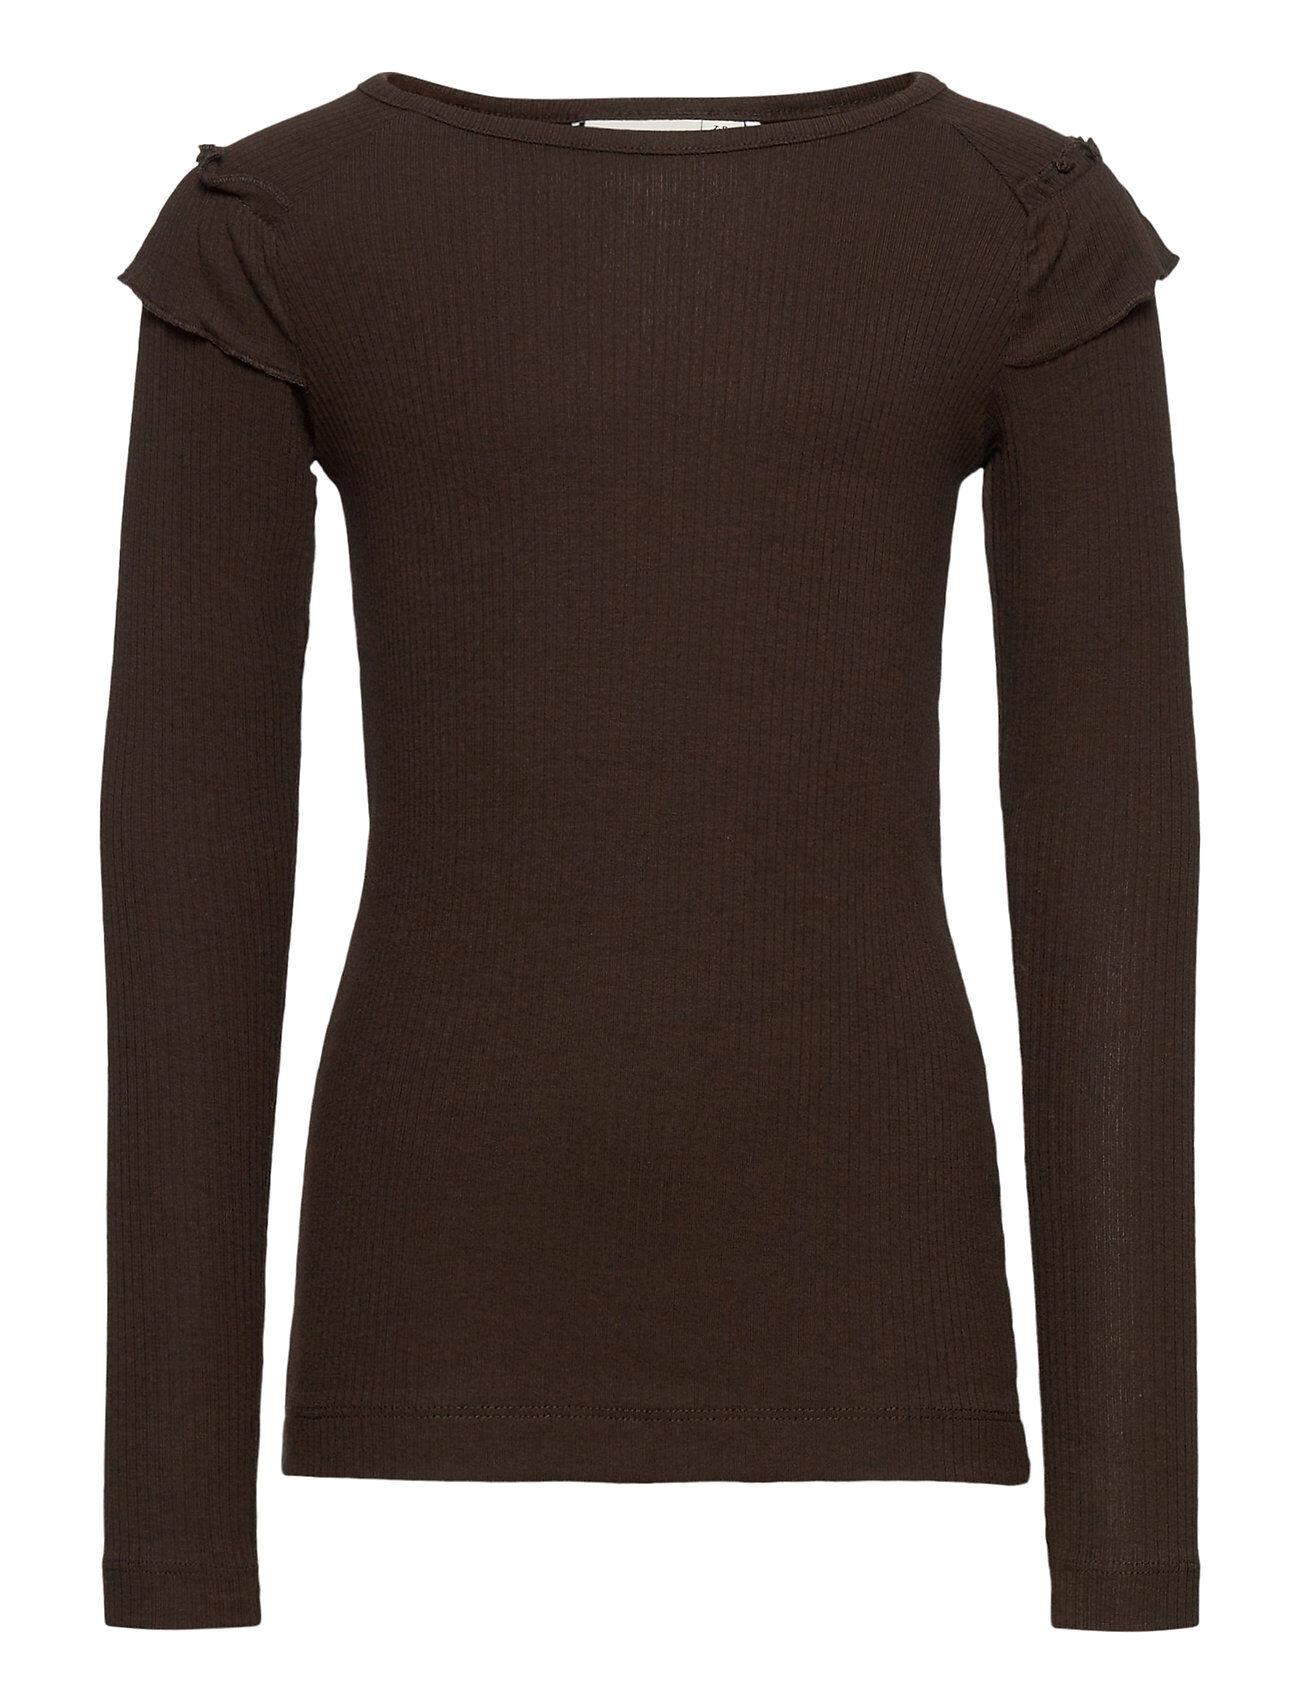 name it Nkfkabex Ls Slim Top T-shirts Long-sleeved T-shirts Ruskea Name It